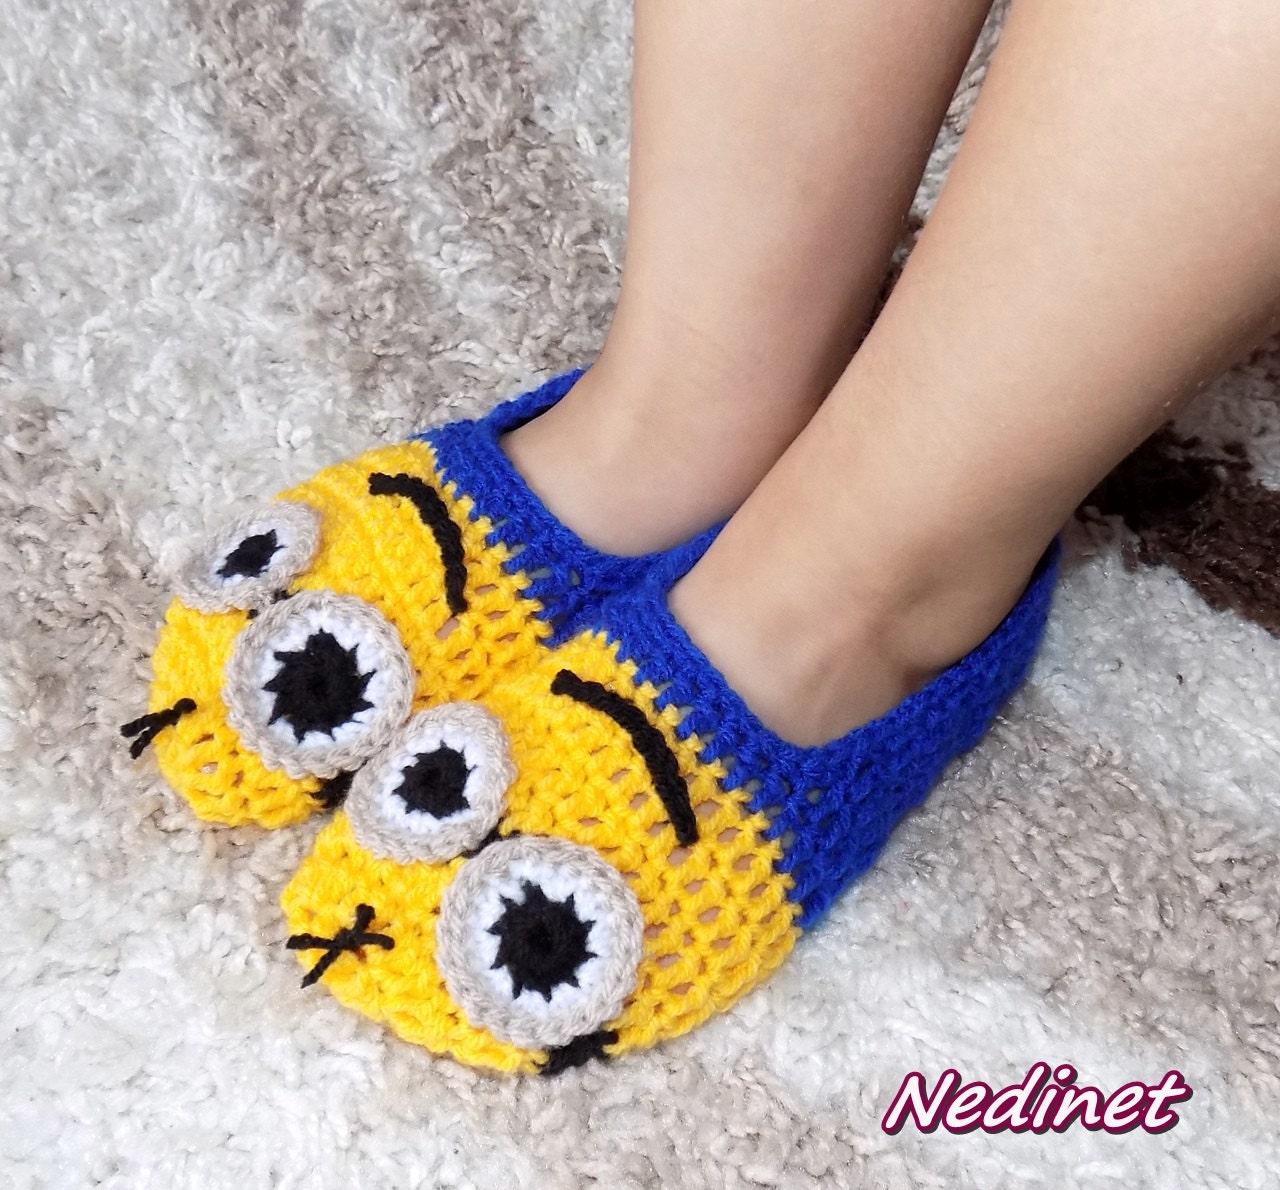 Crochet Minion slippers, Minion mittens, crochet pattern, crochet ...